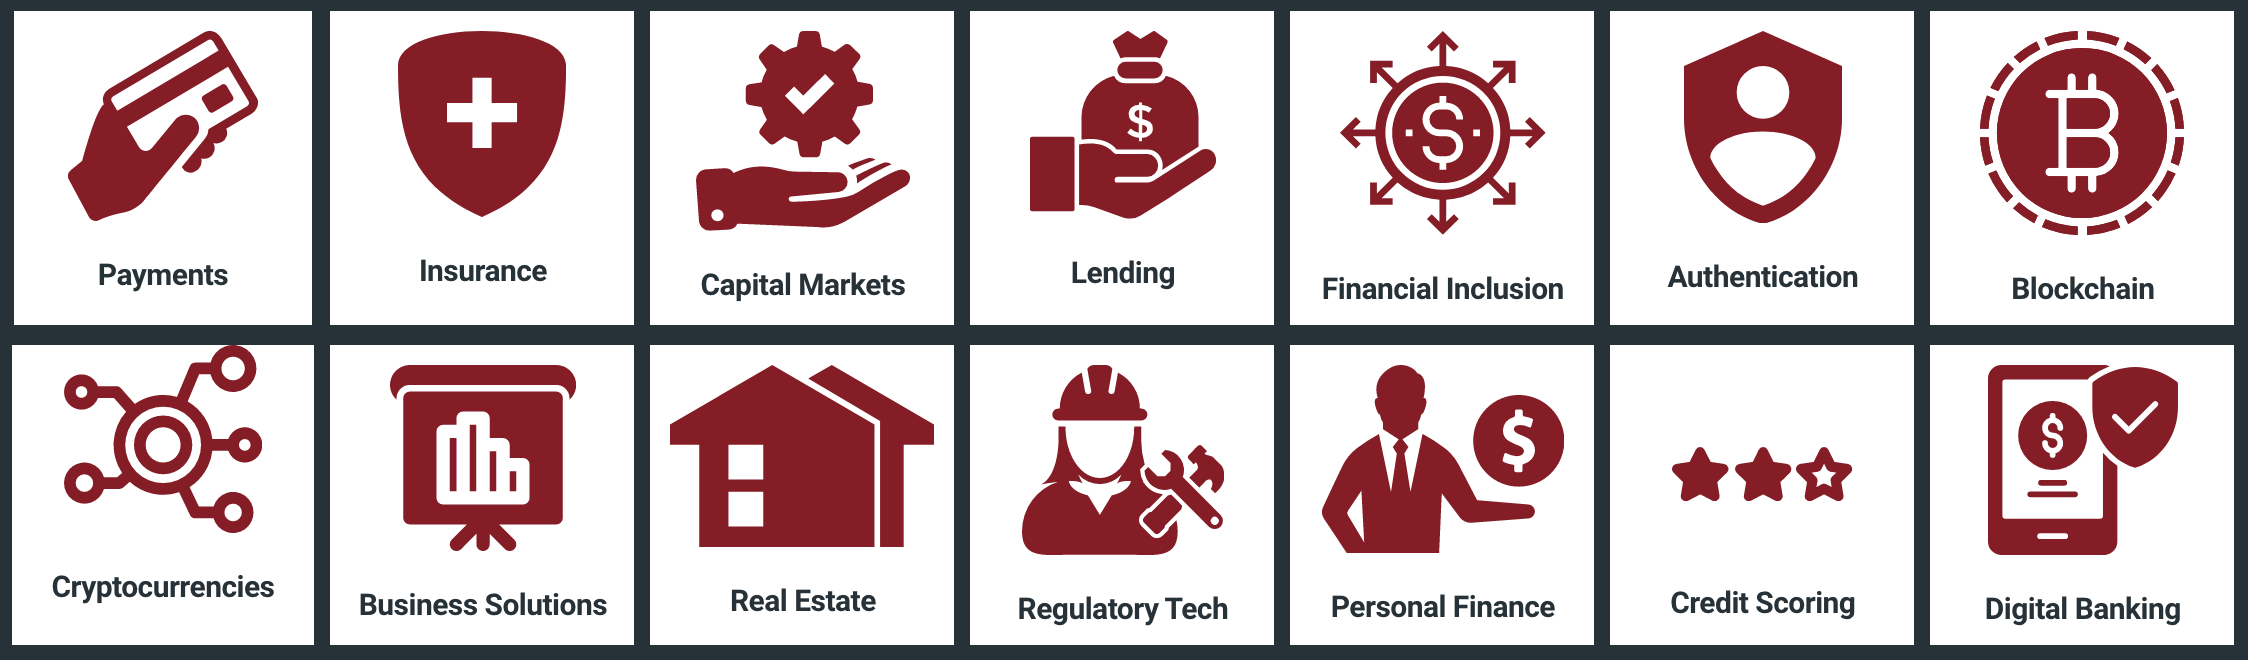 Focus areas bongoHive Fintech 2020